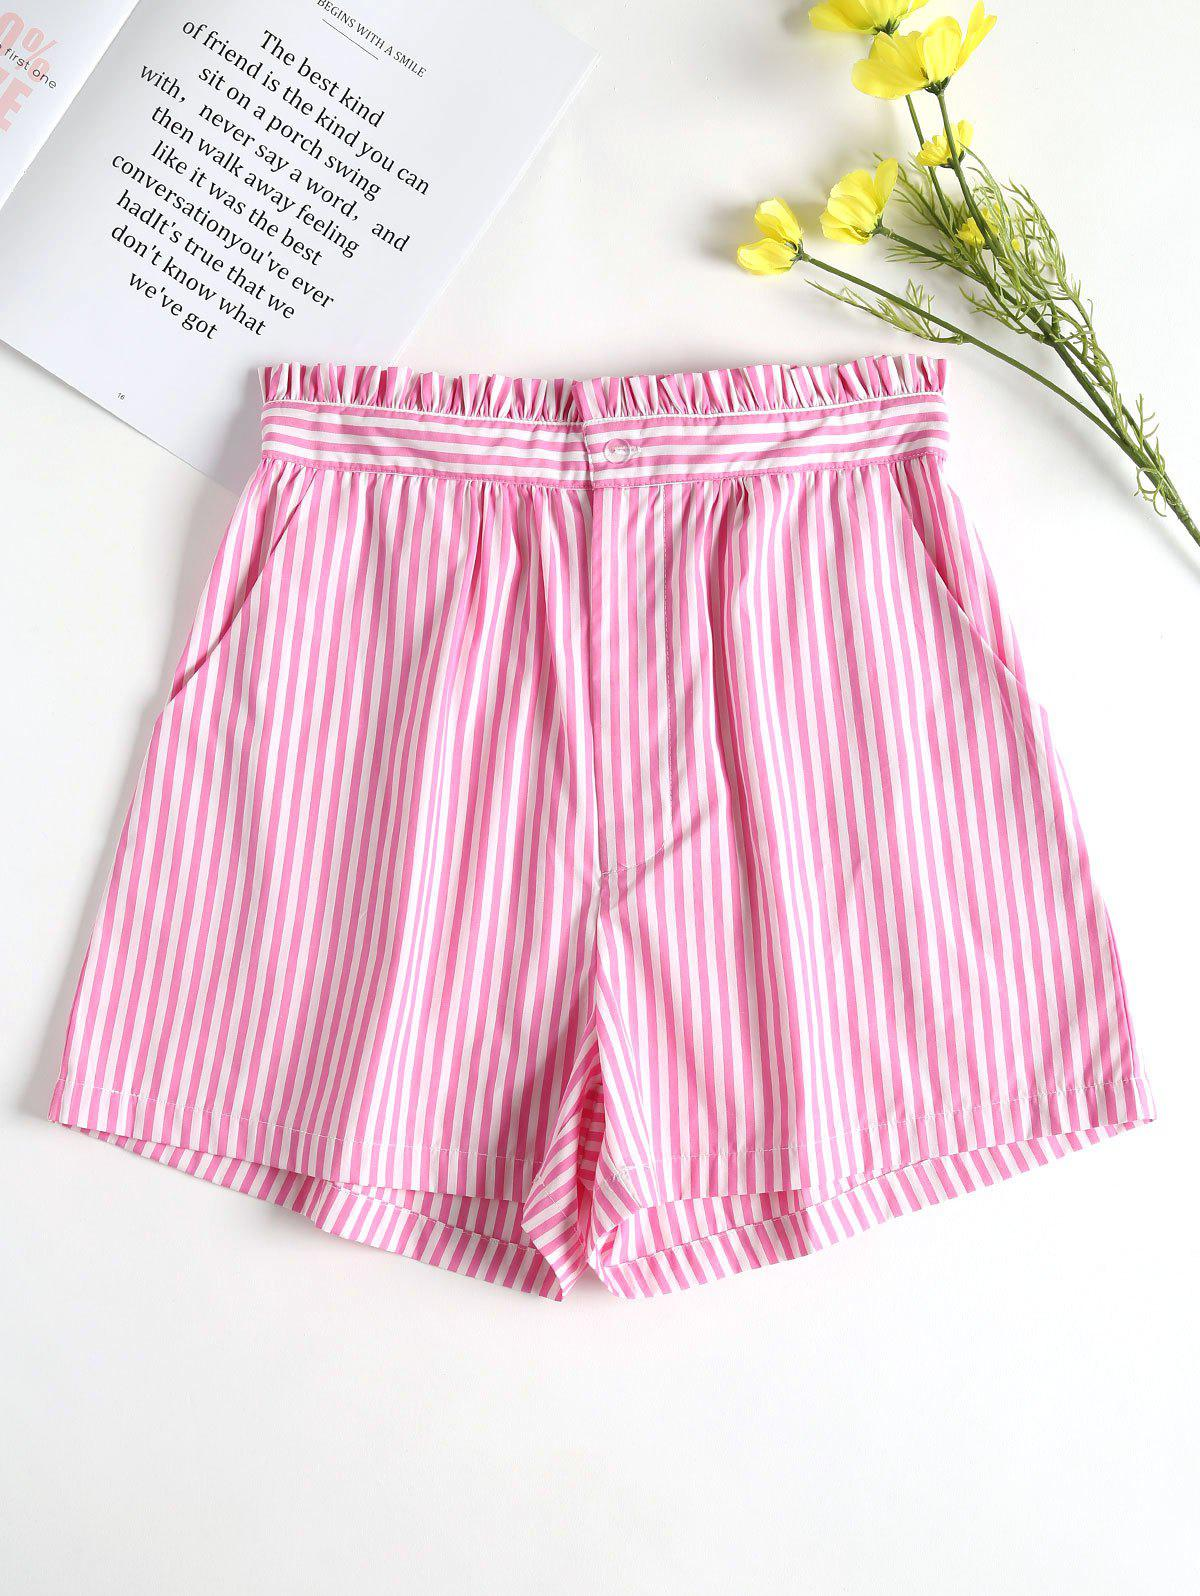 Pockets Striped High Waisted Shorts